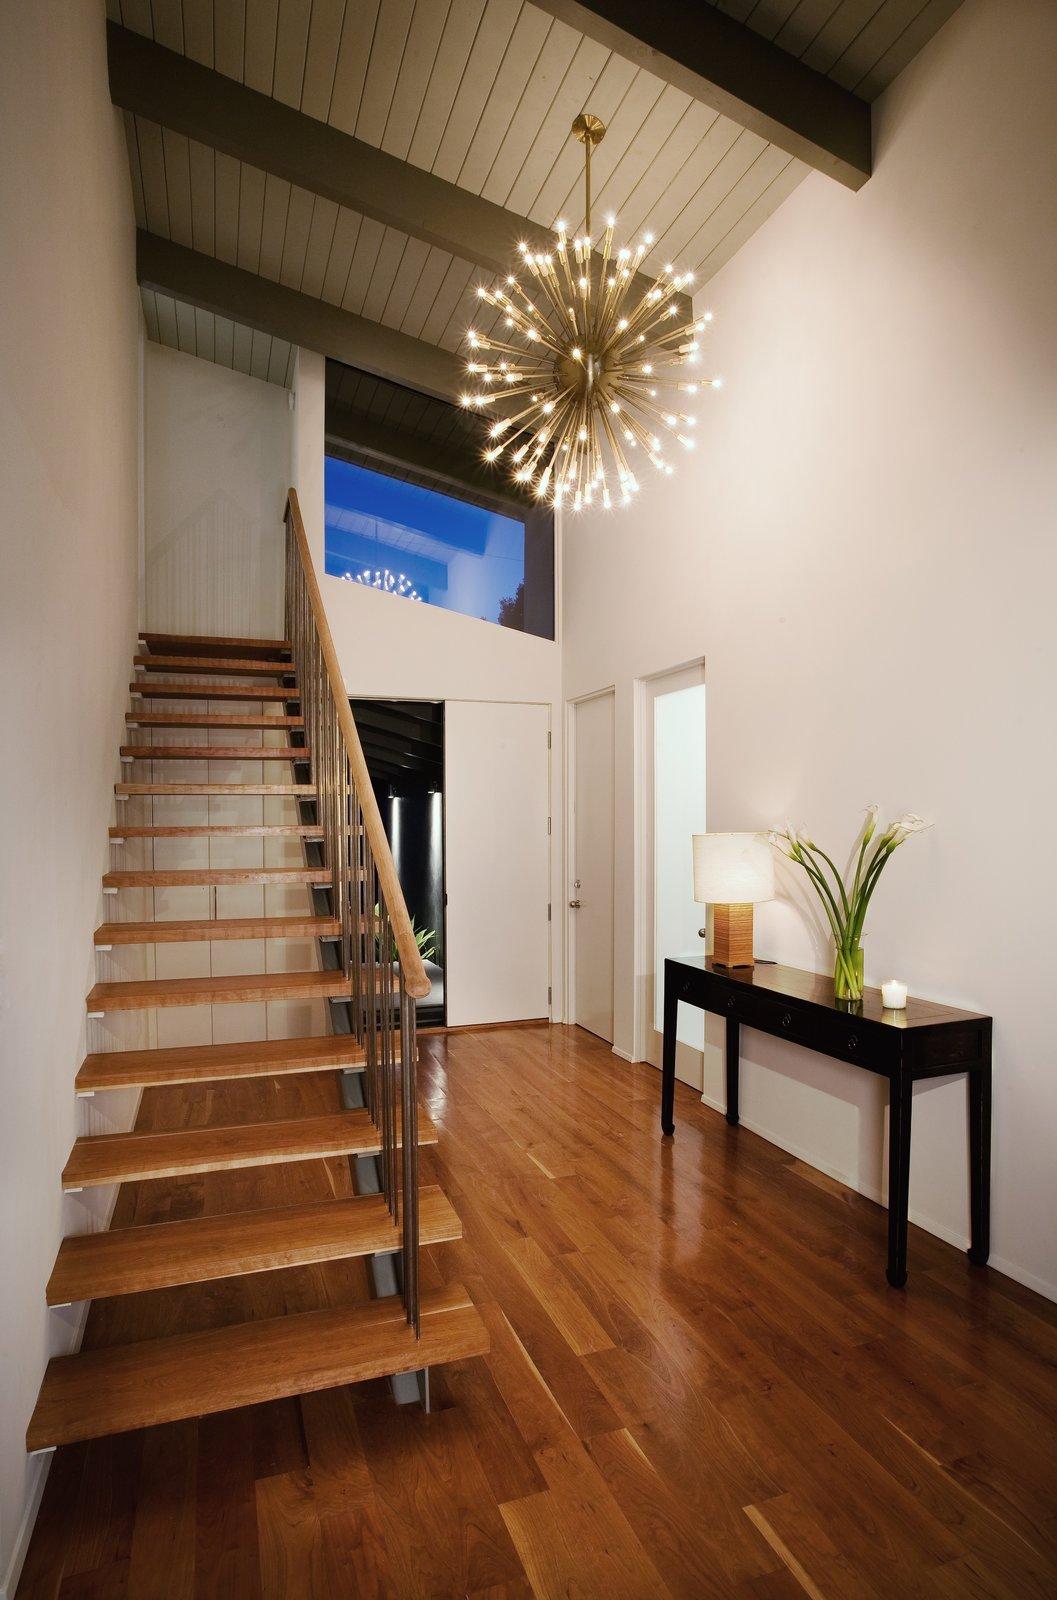 #brass #sputnik #chandelier #lighting #interior #modern #hallway #walkway #stairs #woodfloor   60+ Modern Lighting Solutions by Dwell